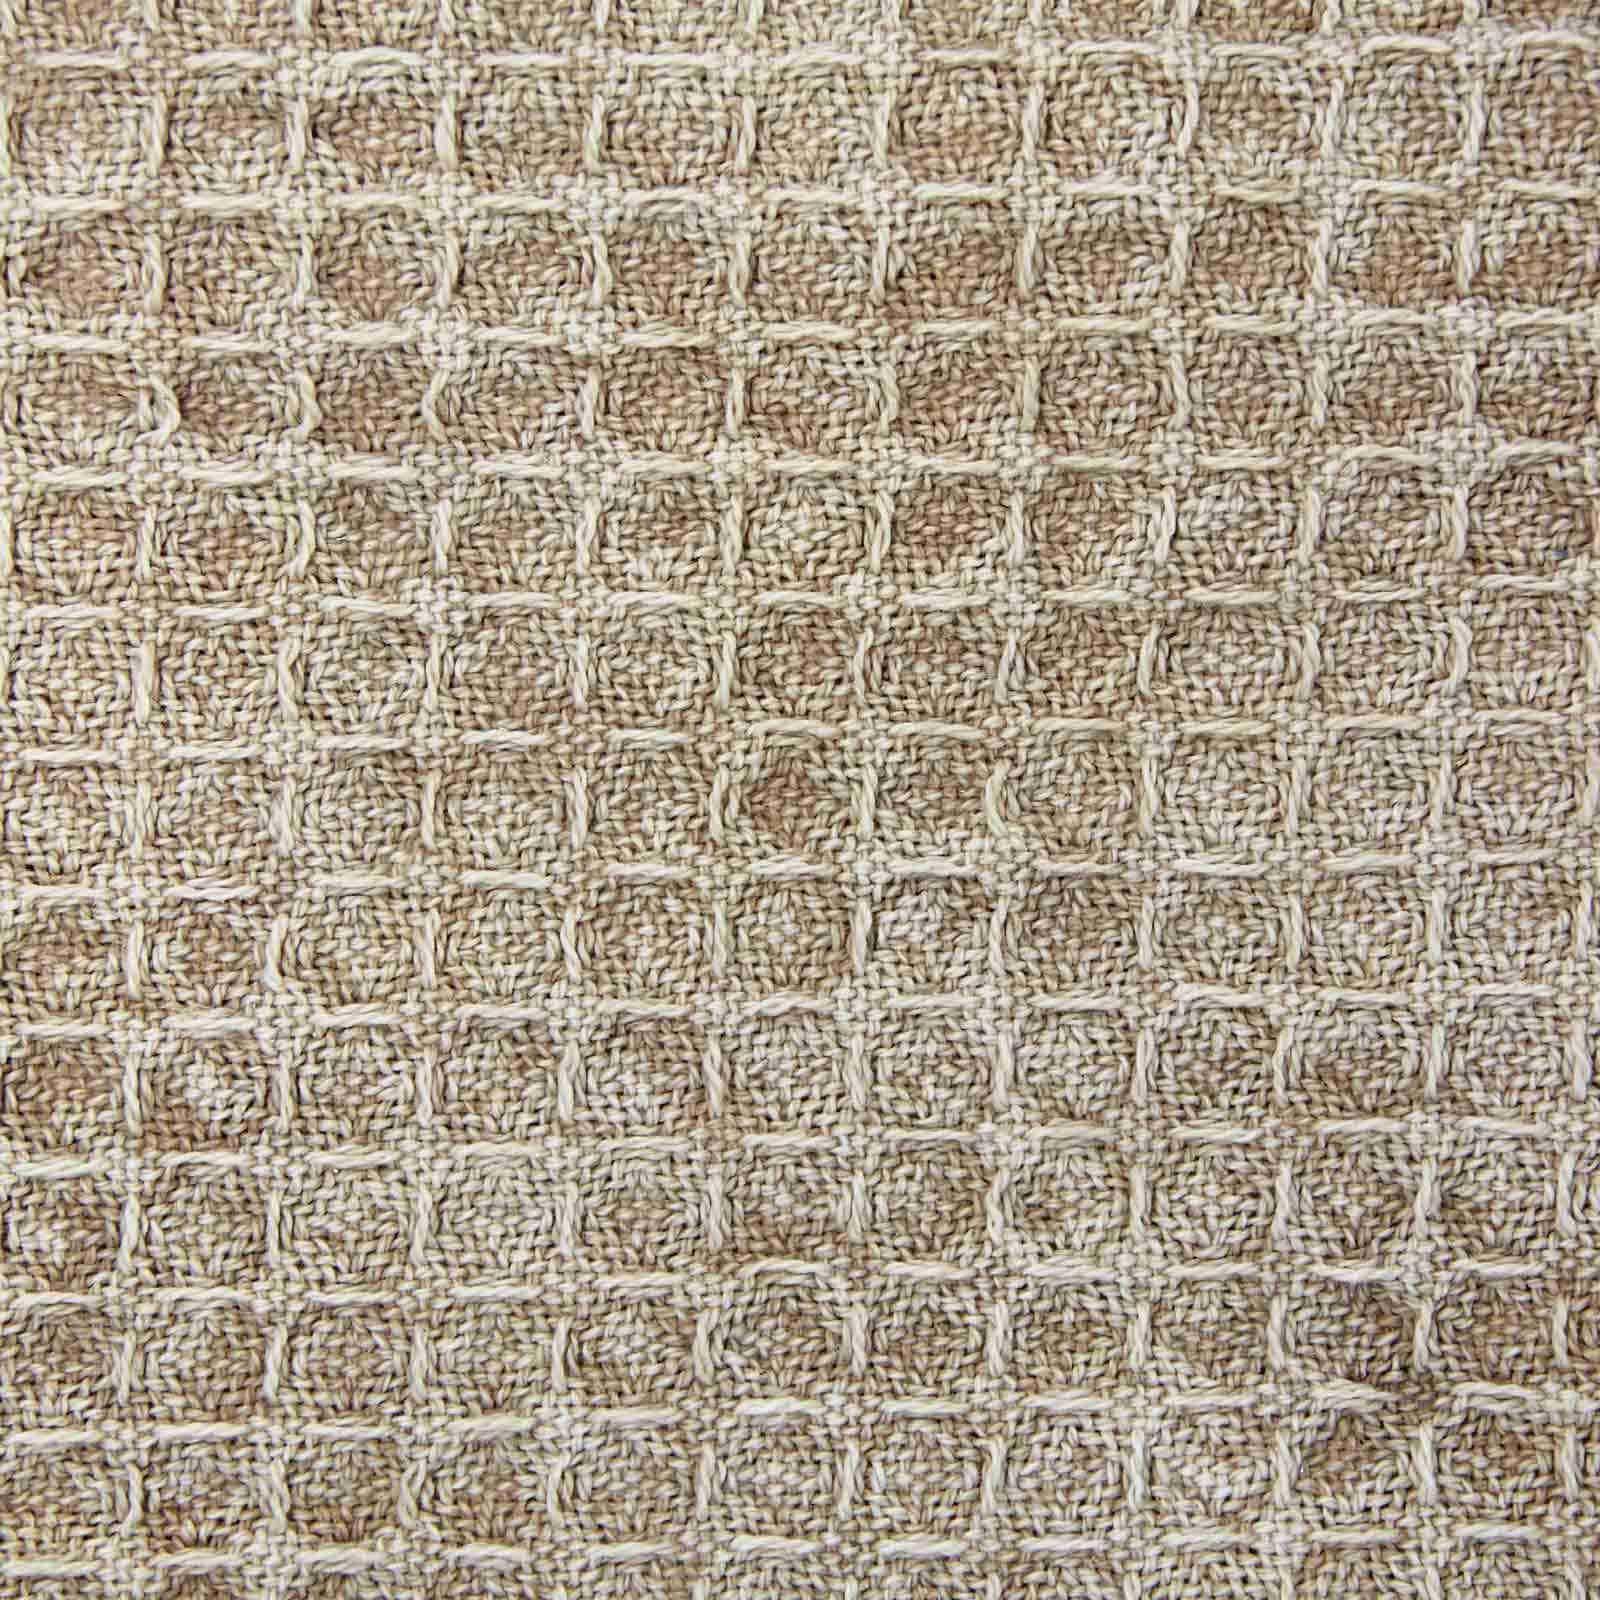 Oregon-Stonewash-Waffle-Throw-Modern-Distressed-Sofa-Bed-Blankets-100-Cotton thumbnail 8